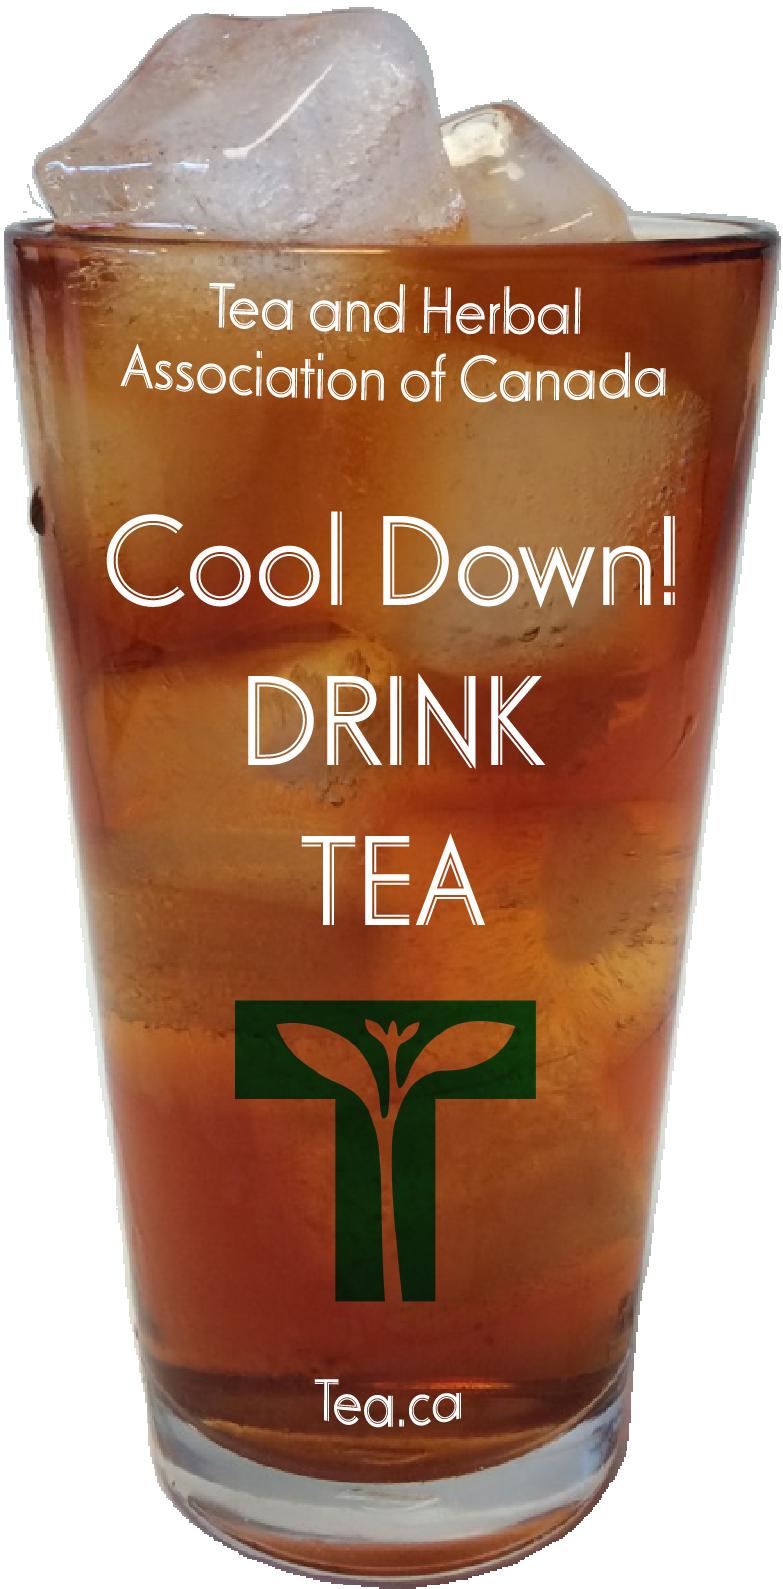 Cool Down! Drink Tea